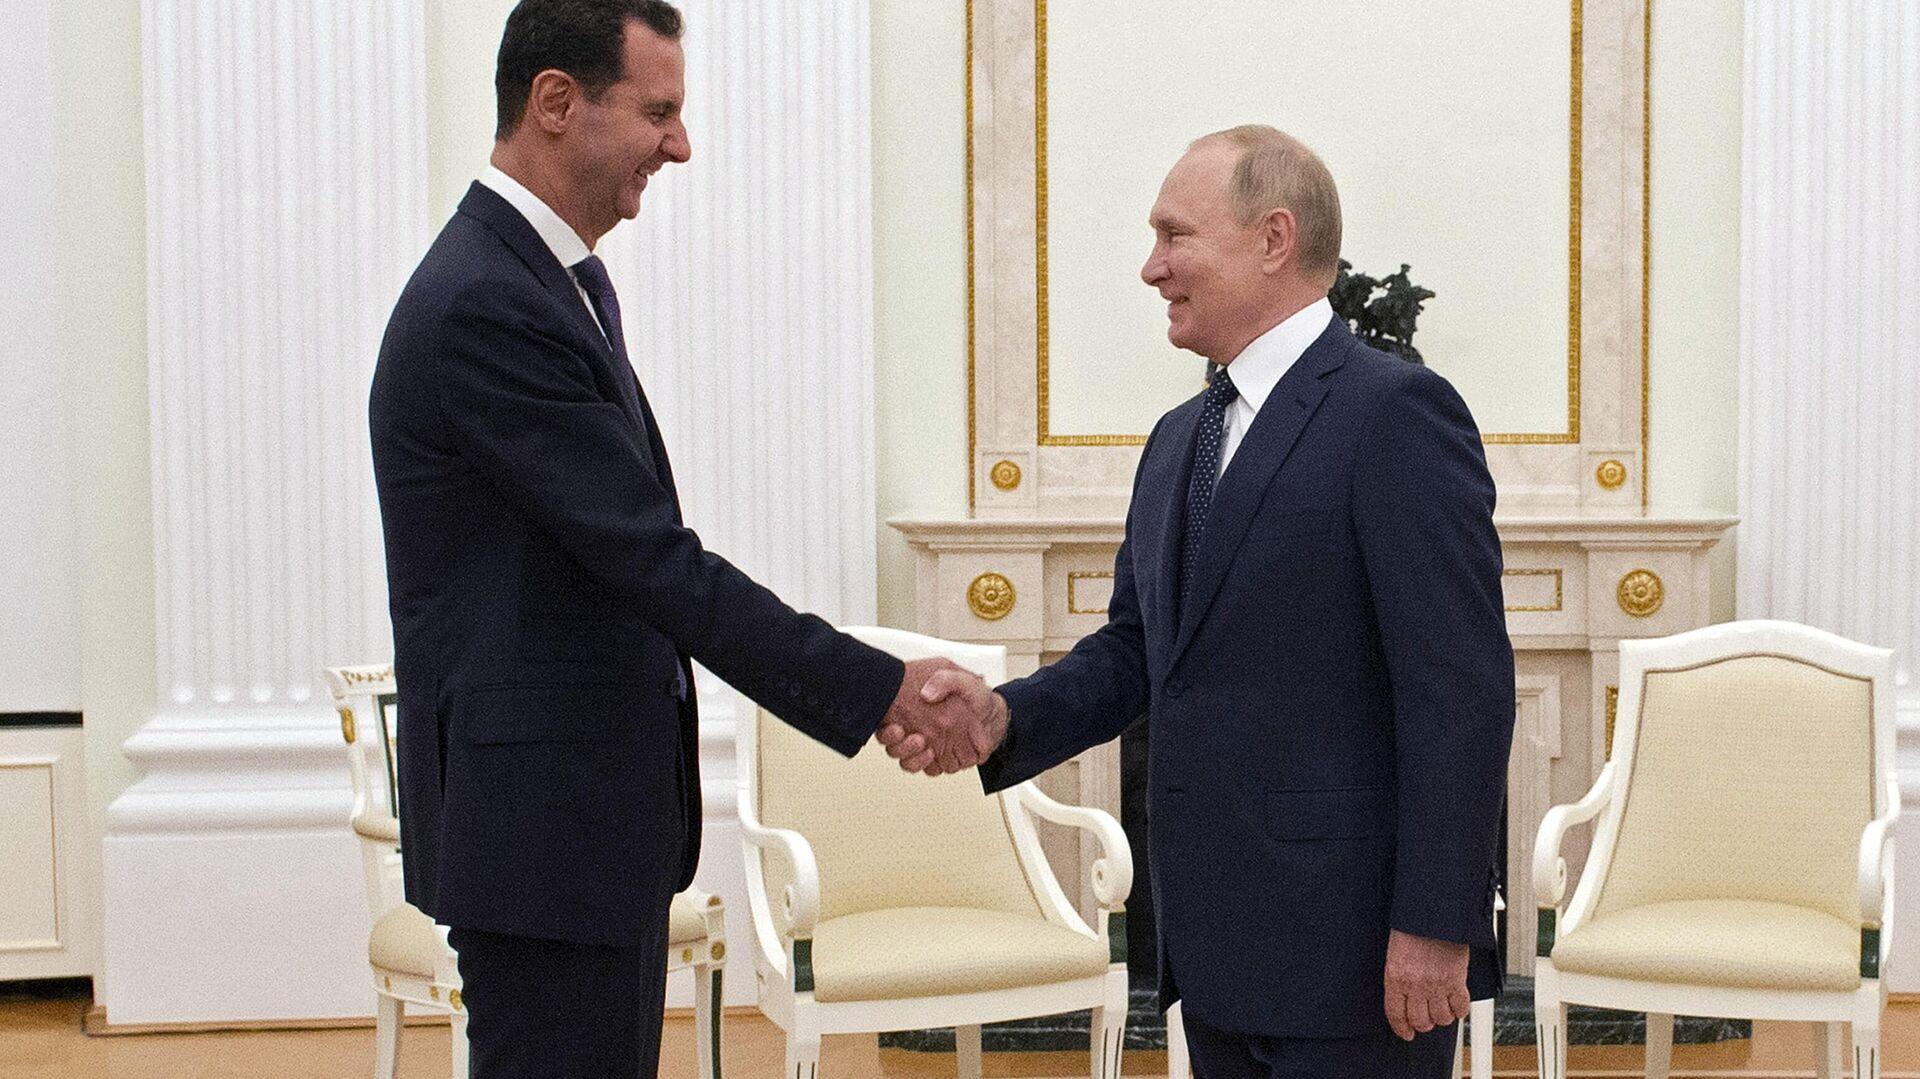 L'incontro tra Vladimir Putin e Bashar Assad - Sputnik Italia, 1920, 14.09.2021